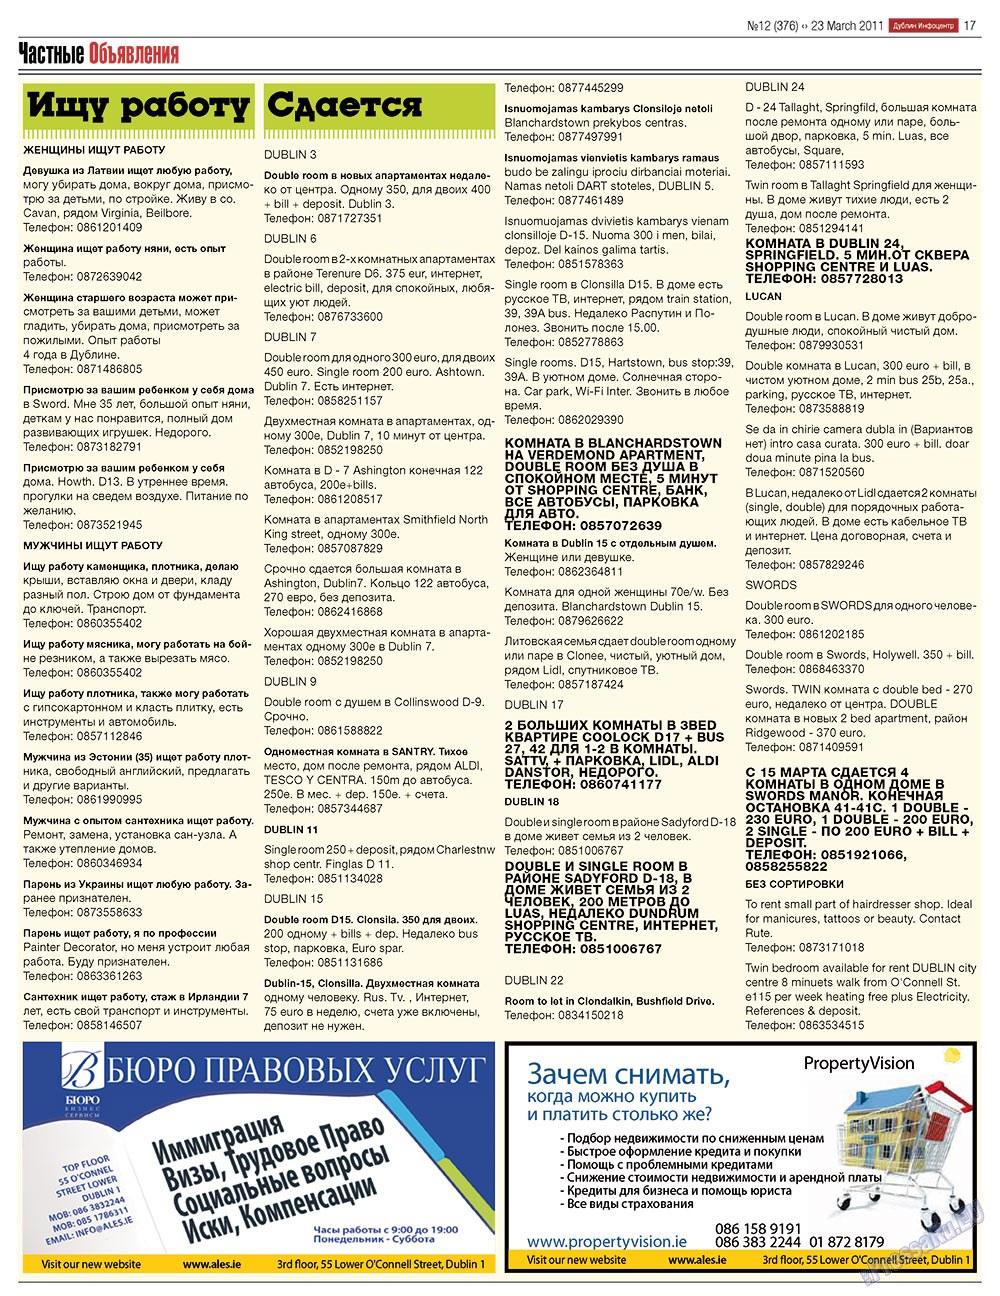 Дублин инфоцентр (газета). 2011 год, номер 12, стр. 17